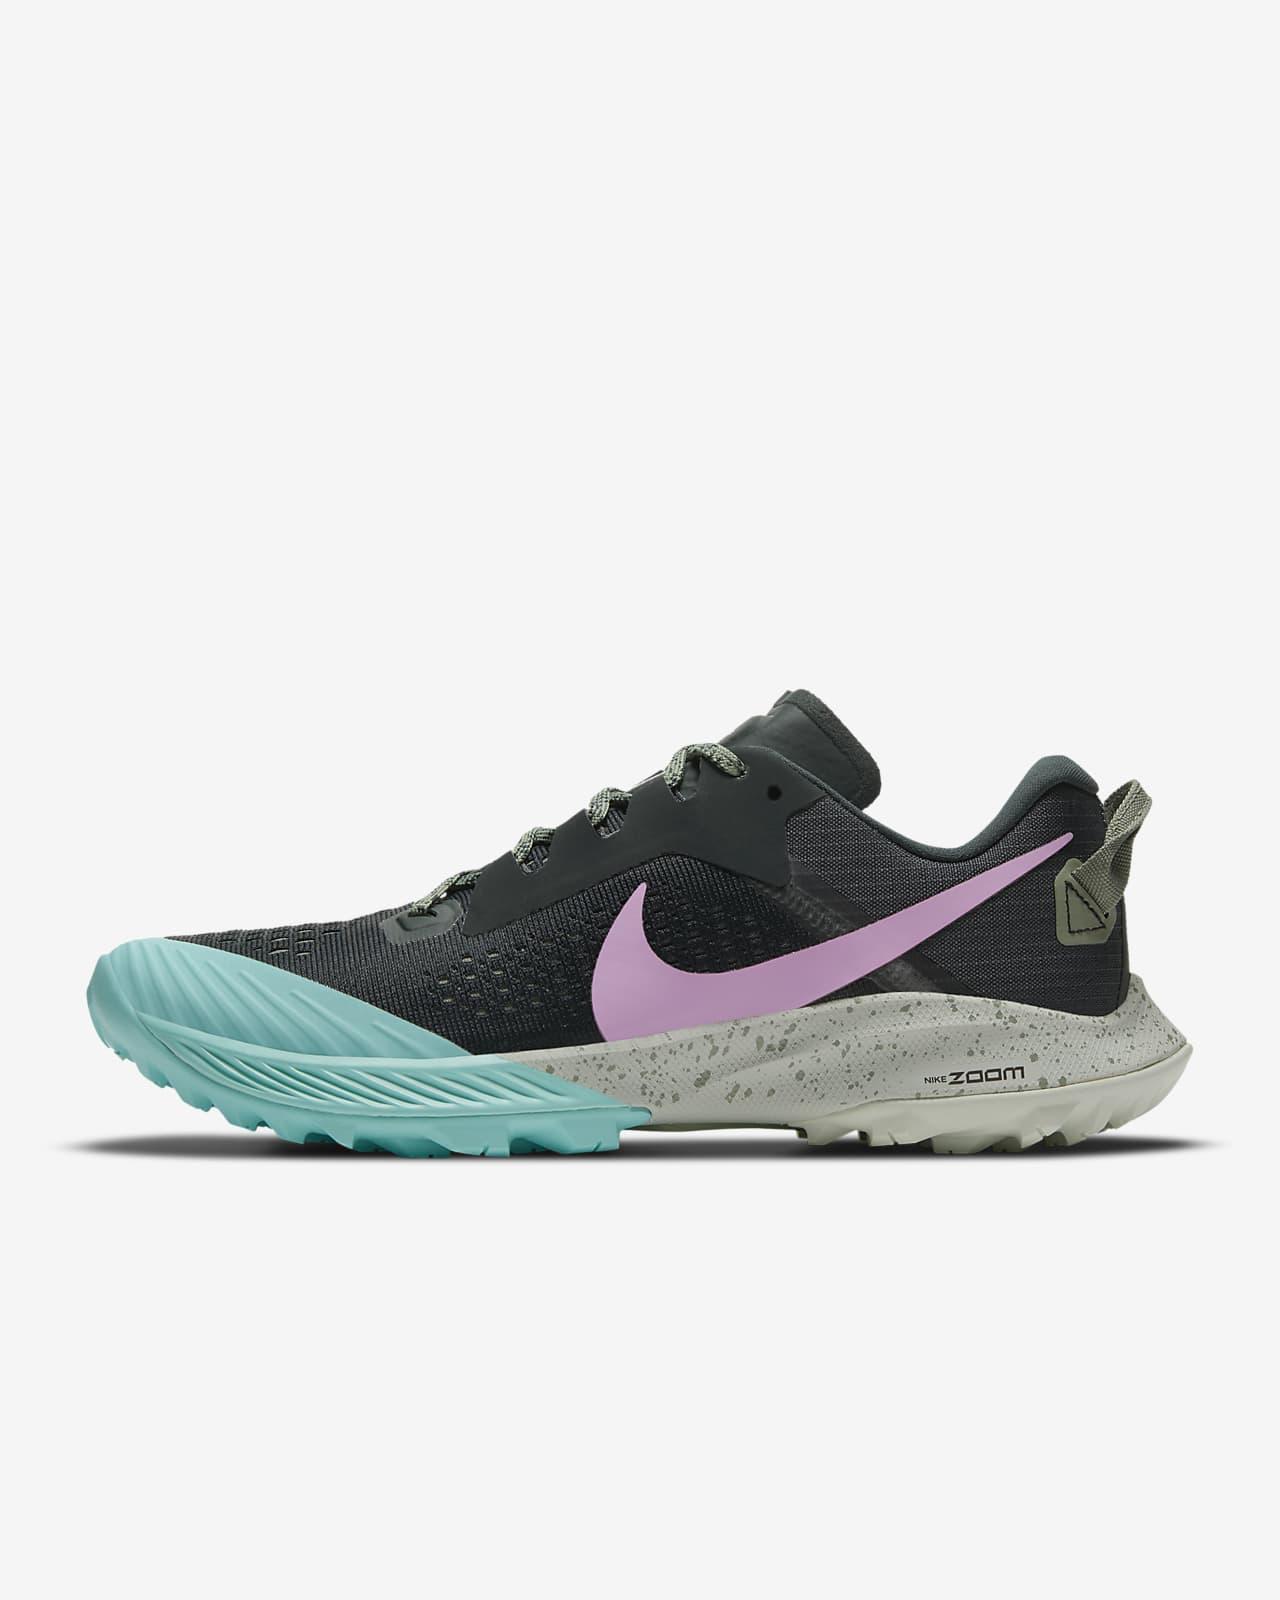 Nike Air Zoom Terra Kiger 6 Women's Trail Running Shoe